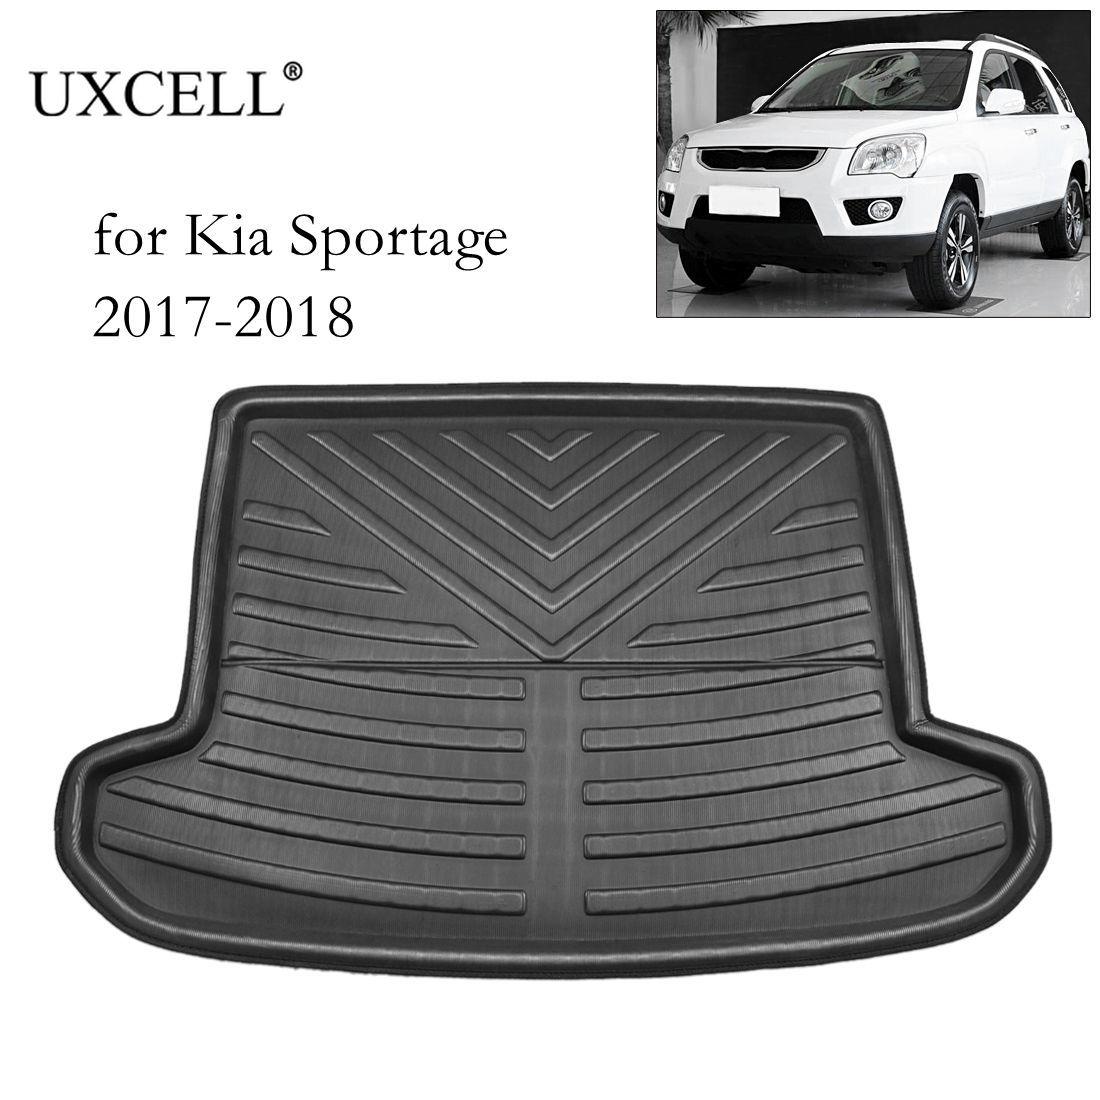 UXCELL PE + EVA espuma de plástico negro maletero piso maletero forro Cargo Mat suelo bandeja alfombra para Kia Sportage R K3 2011 a 2018